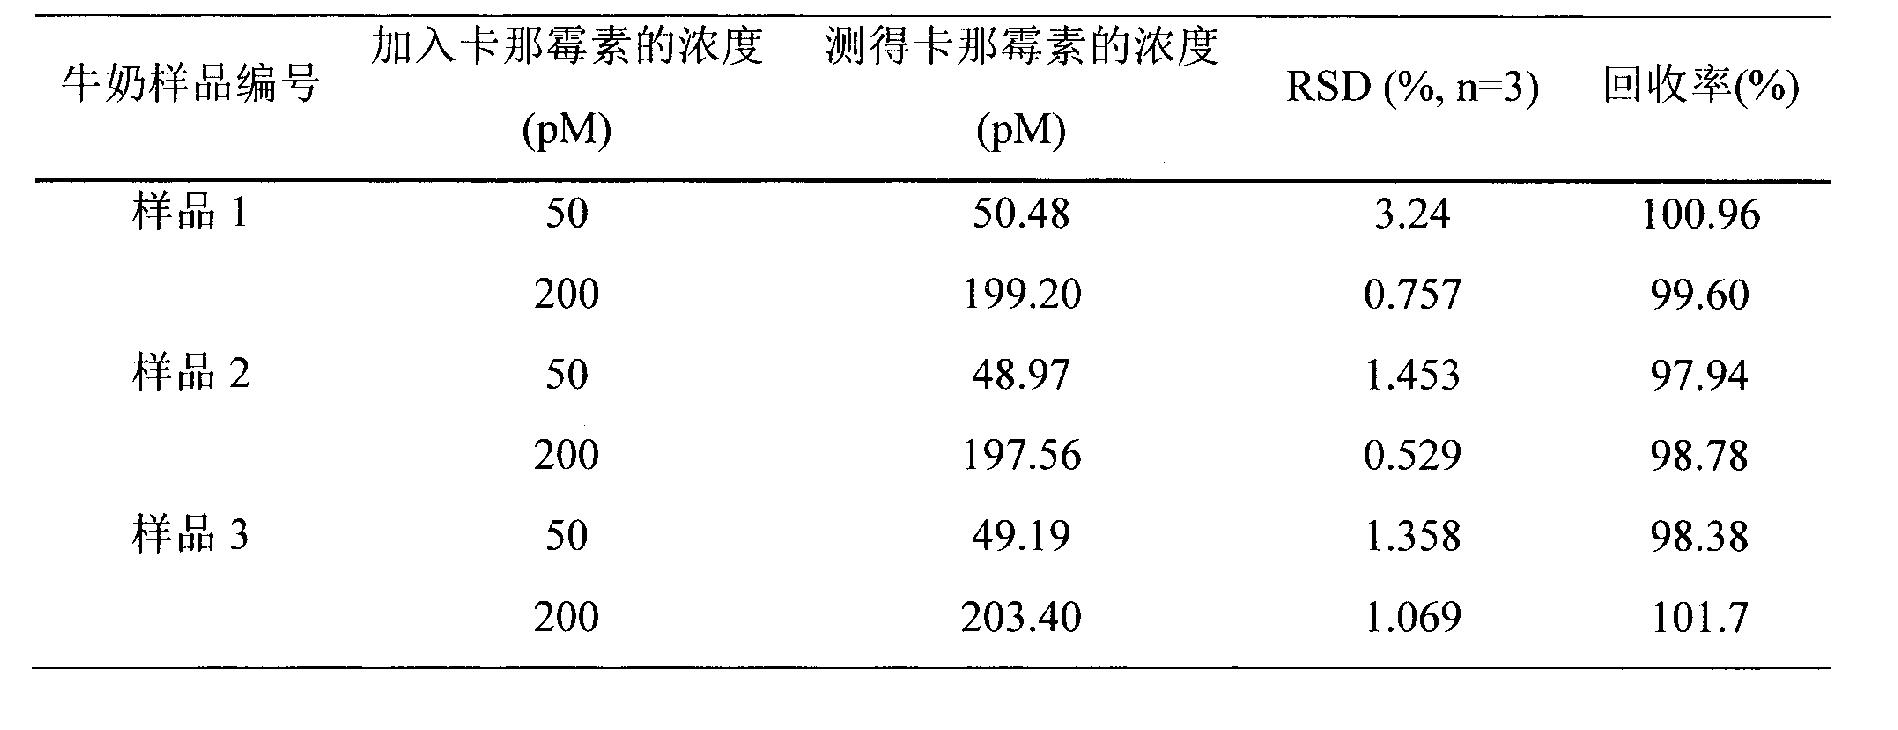 CN105651850A - Method for detecting residual kanamycin